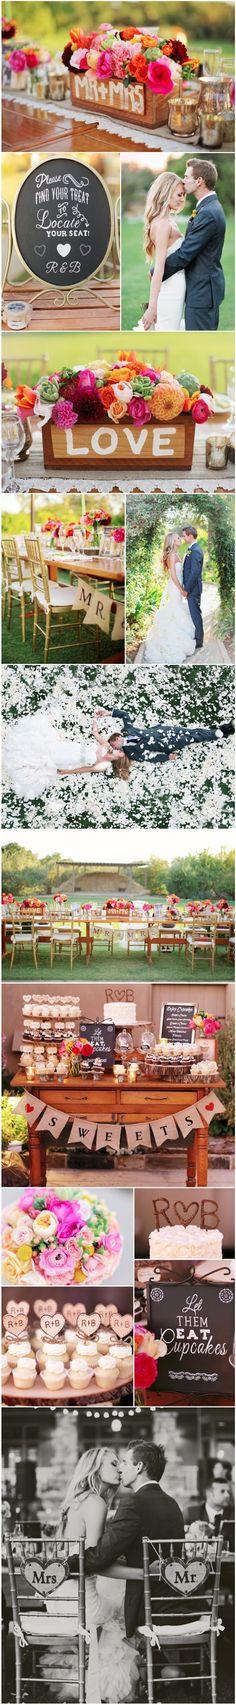 Heartstone Ranch Wedding » Ooh LaLa La Fete